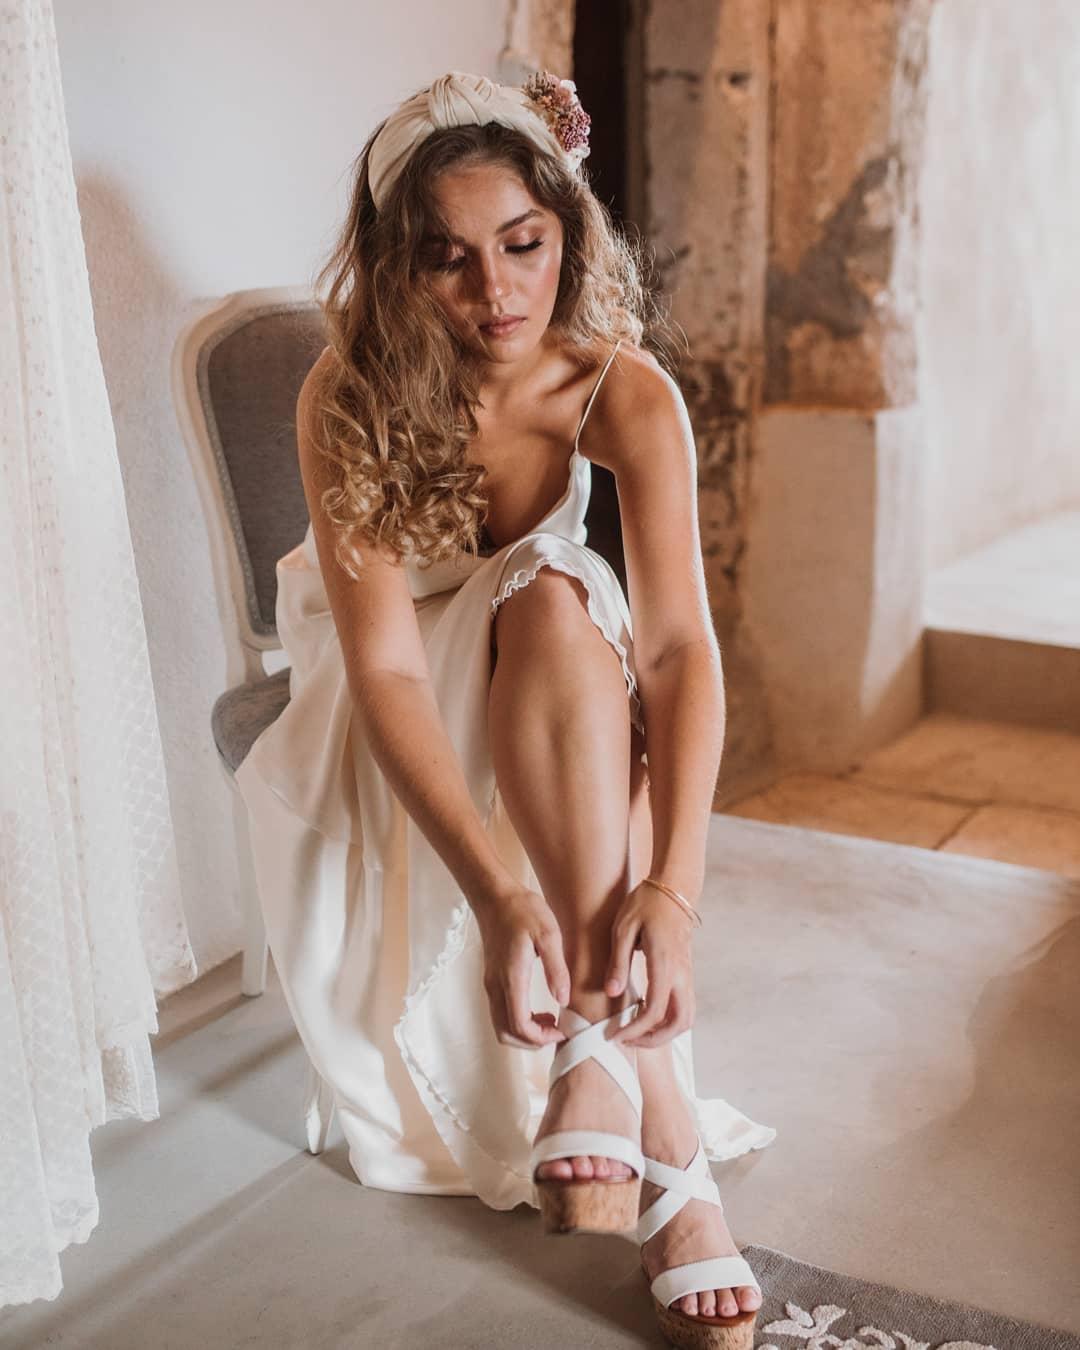 claudia cruz garcia gonzalez, miss international spain 2019. 71081010